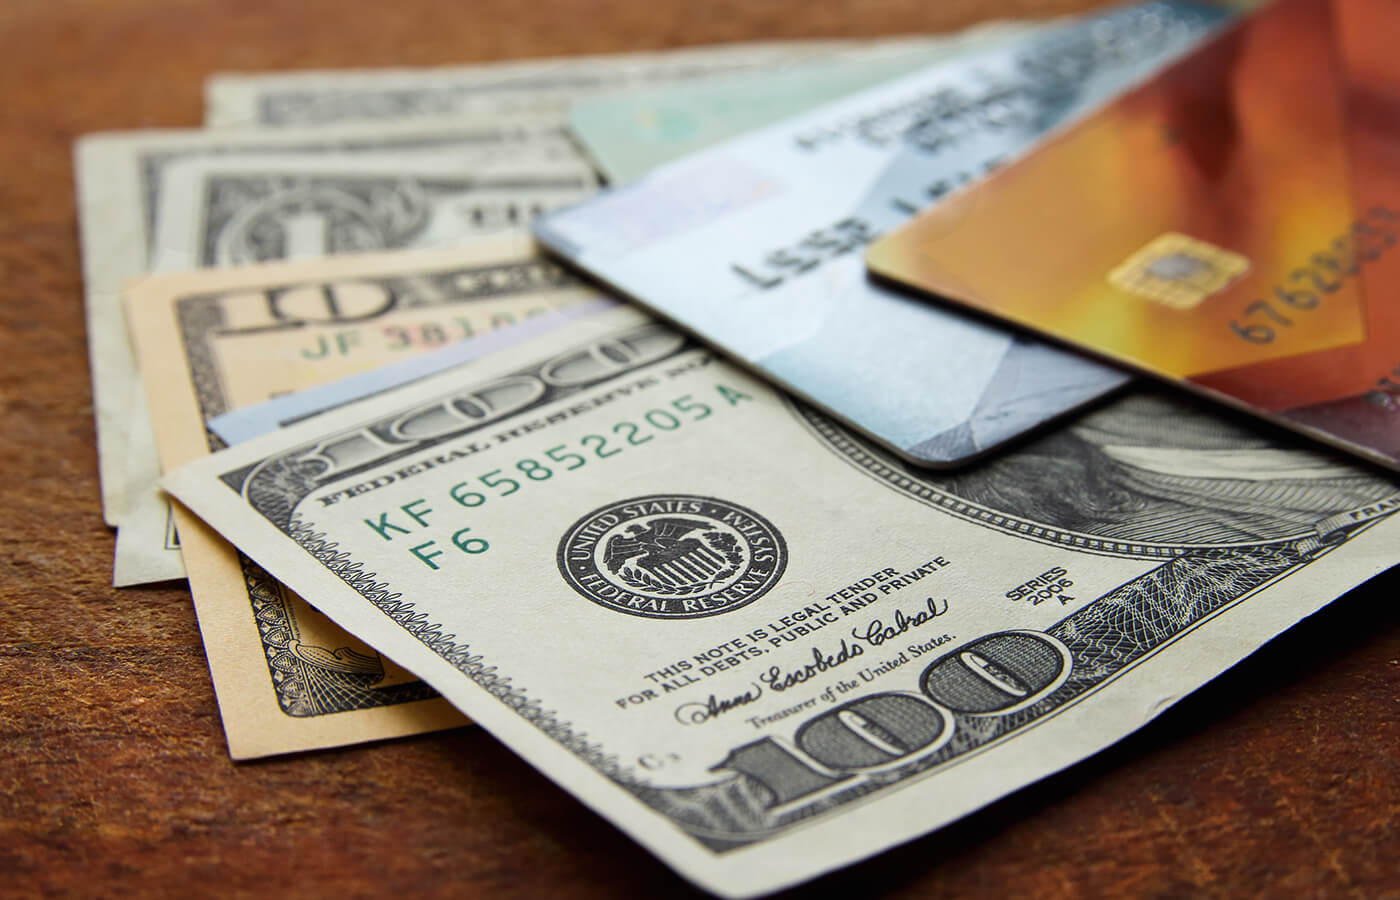 Credit Card Worth